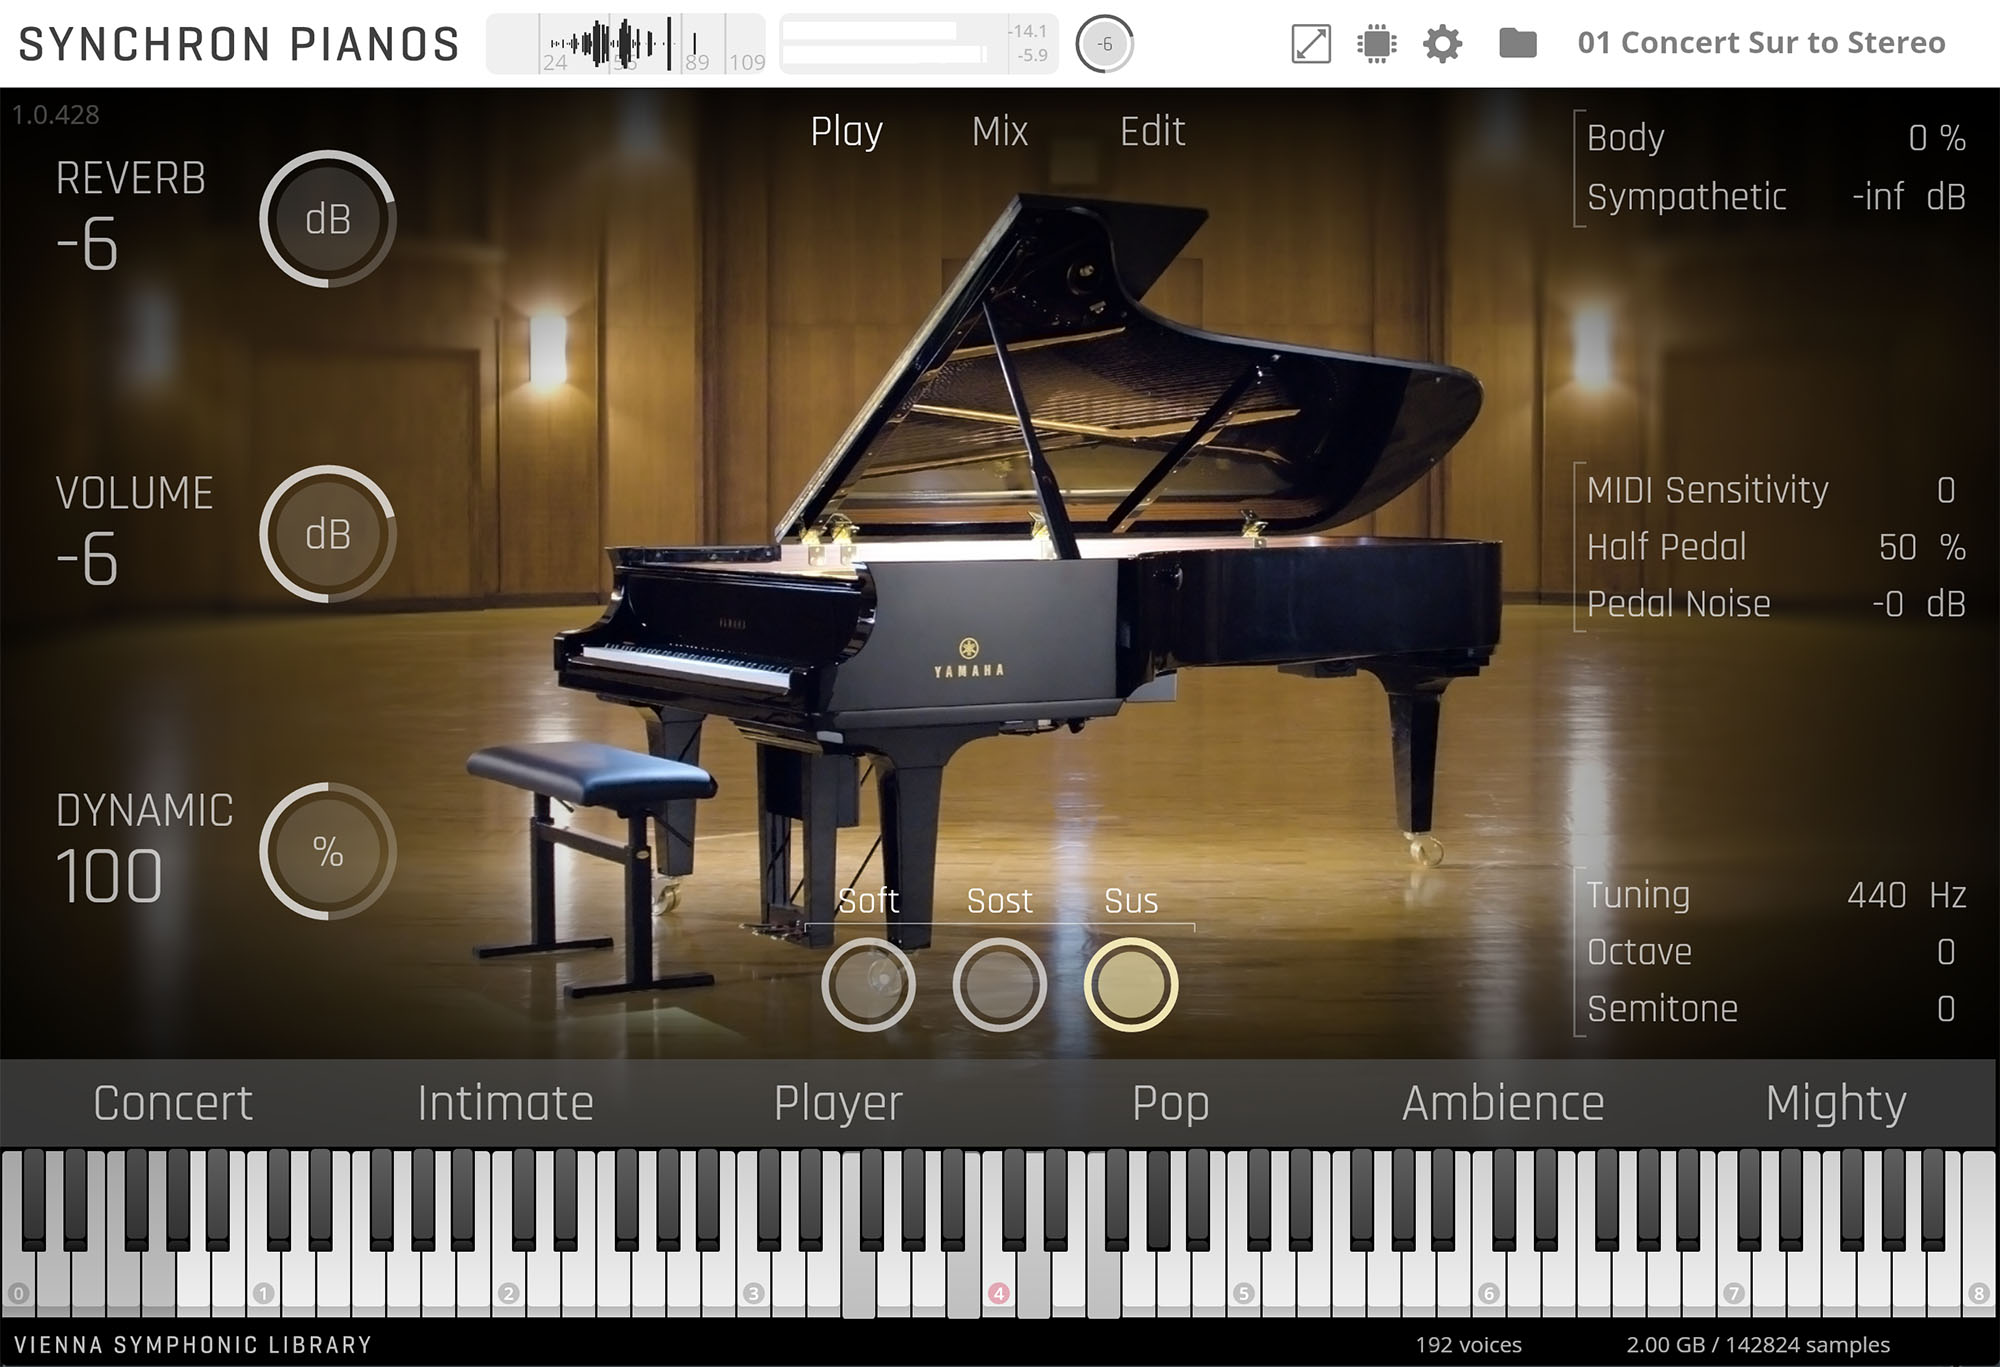 Dating Yamaha pianon